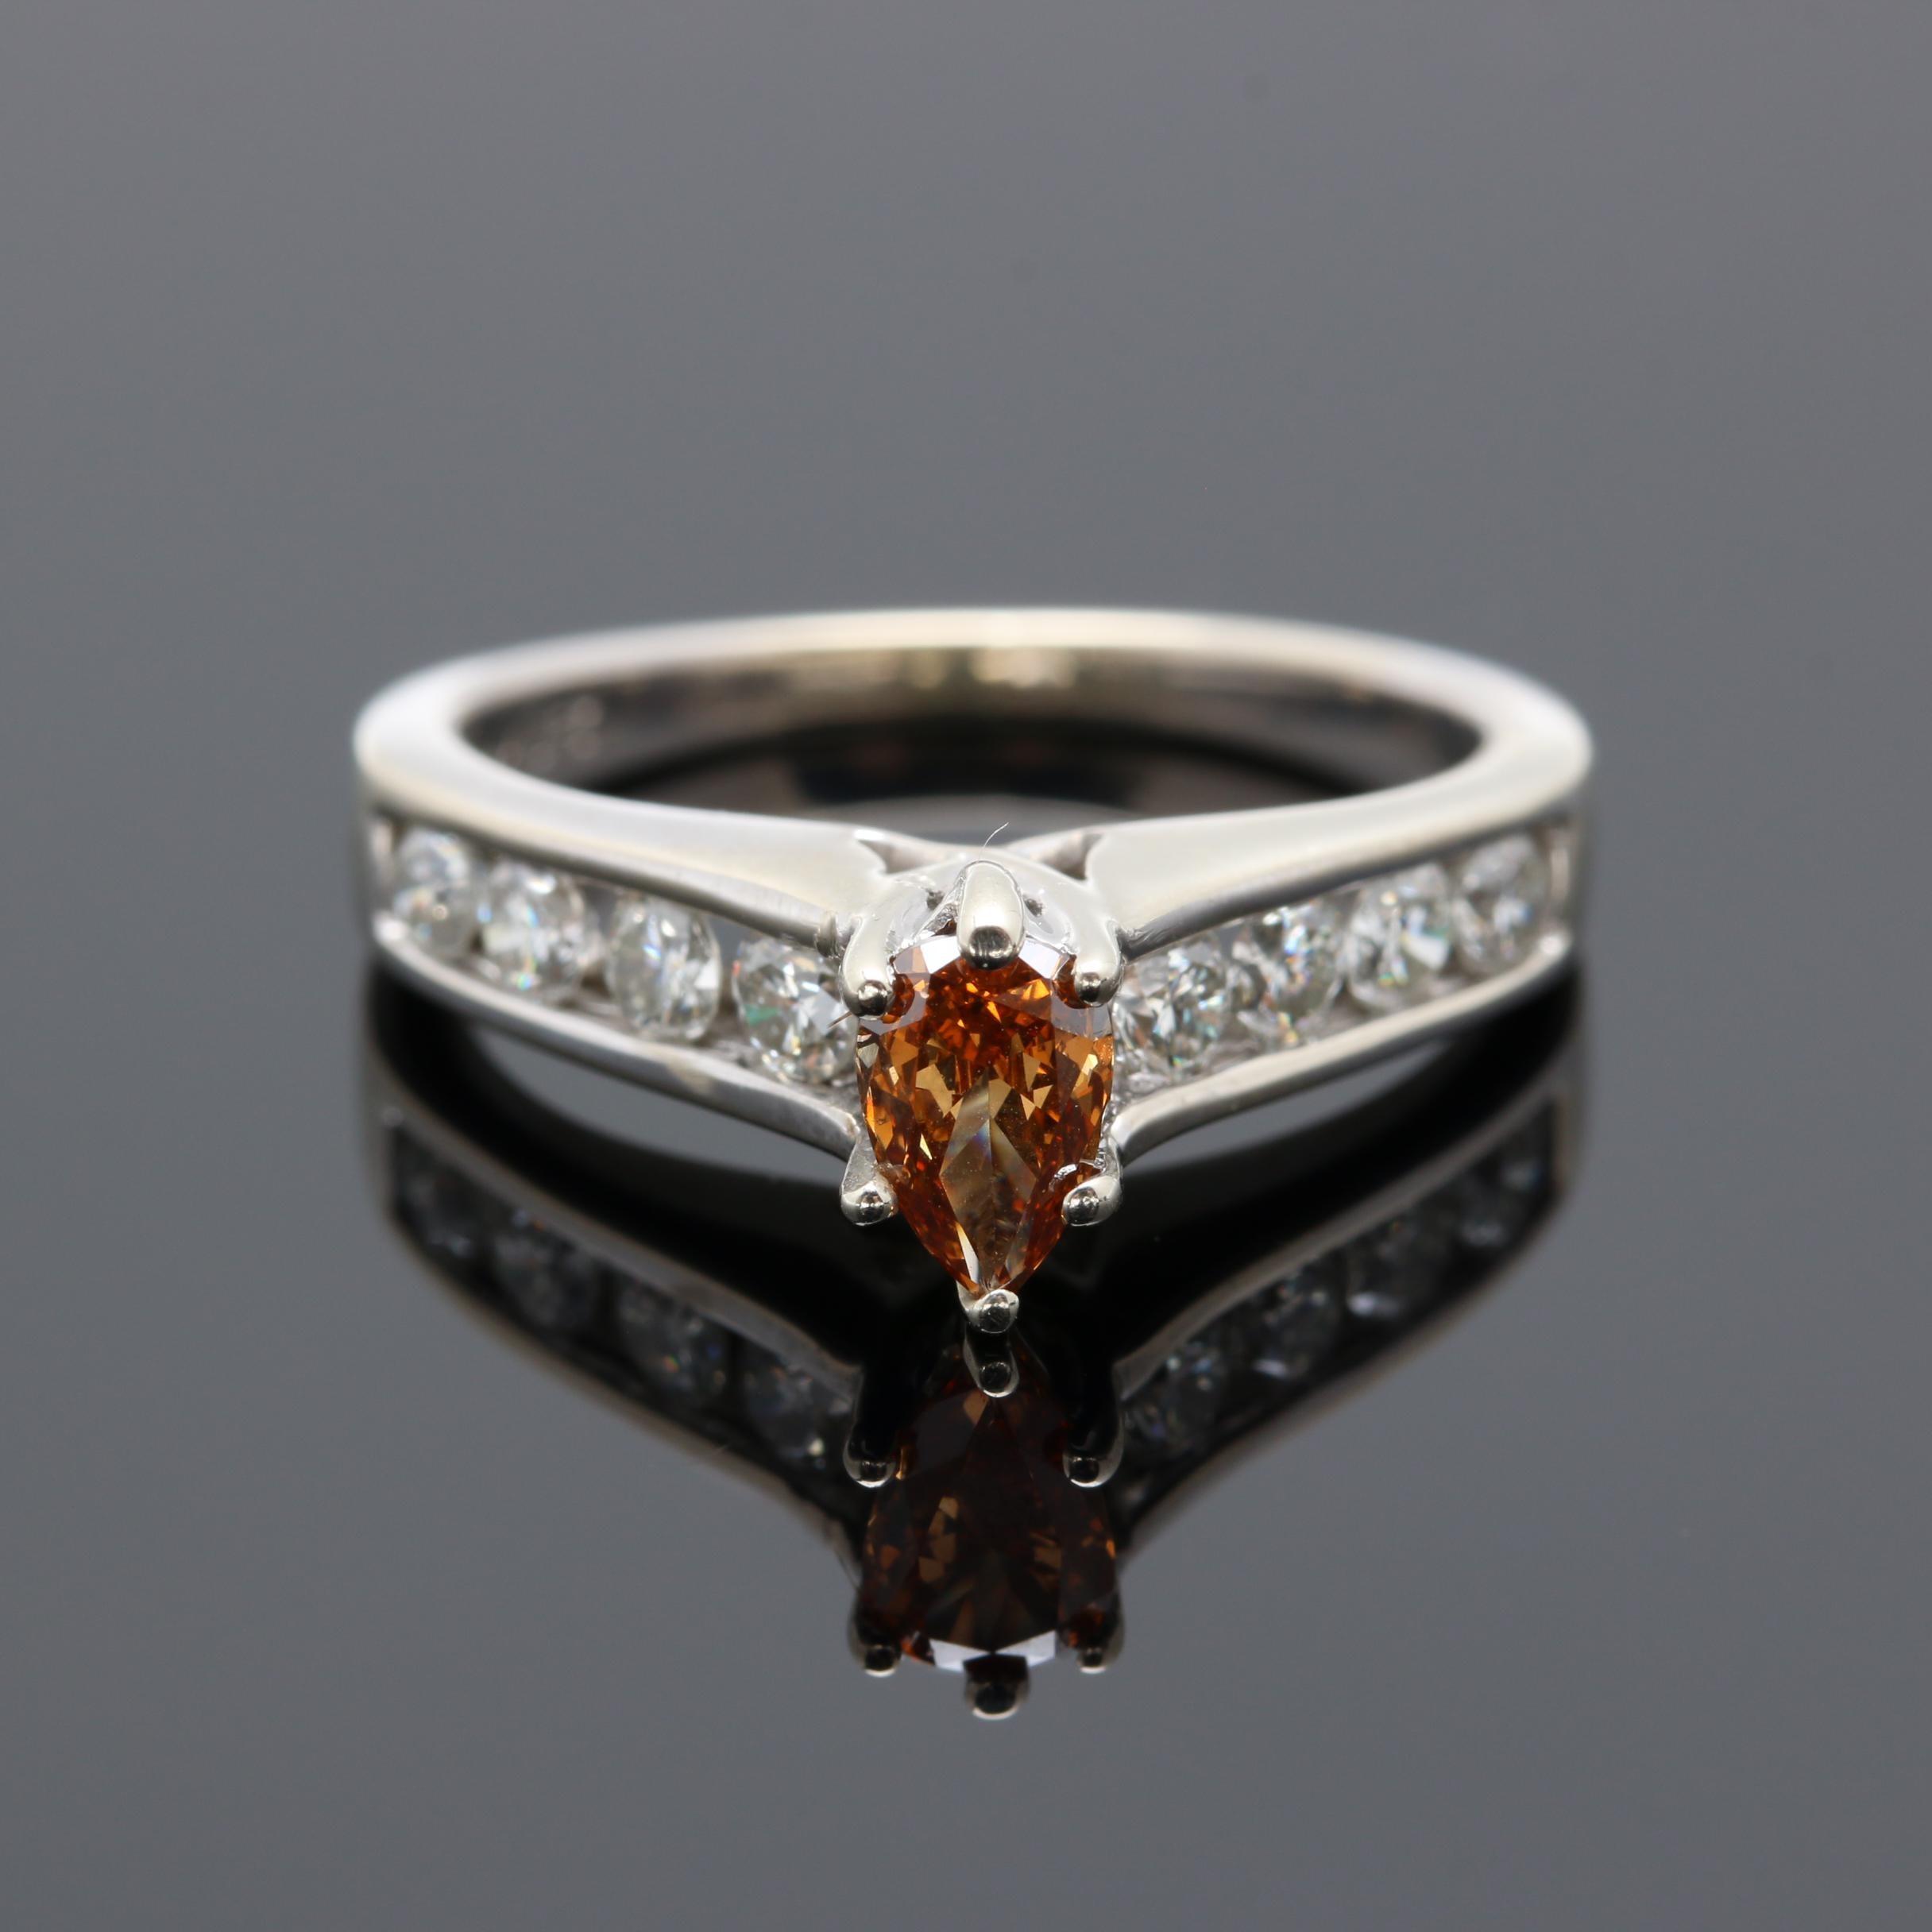 14K White Gold Orange Diamond Ring with Diamond Accents